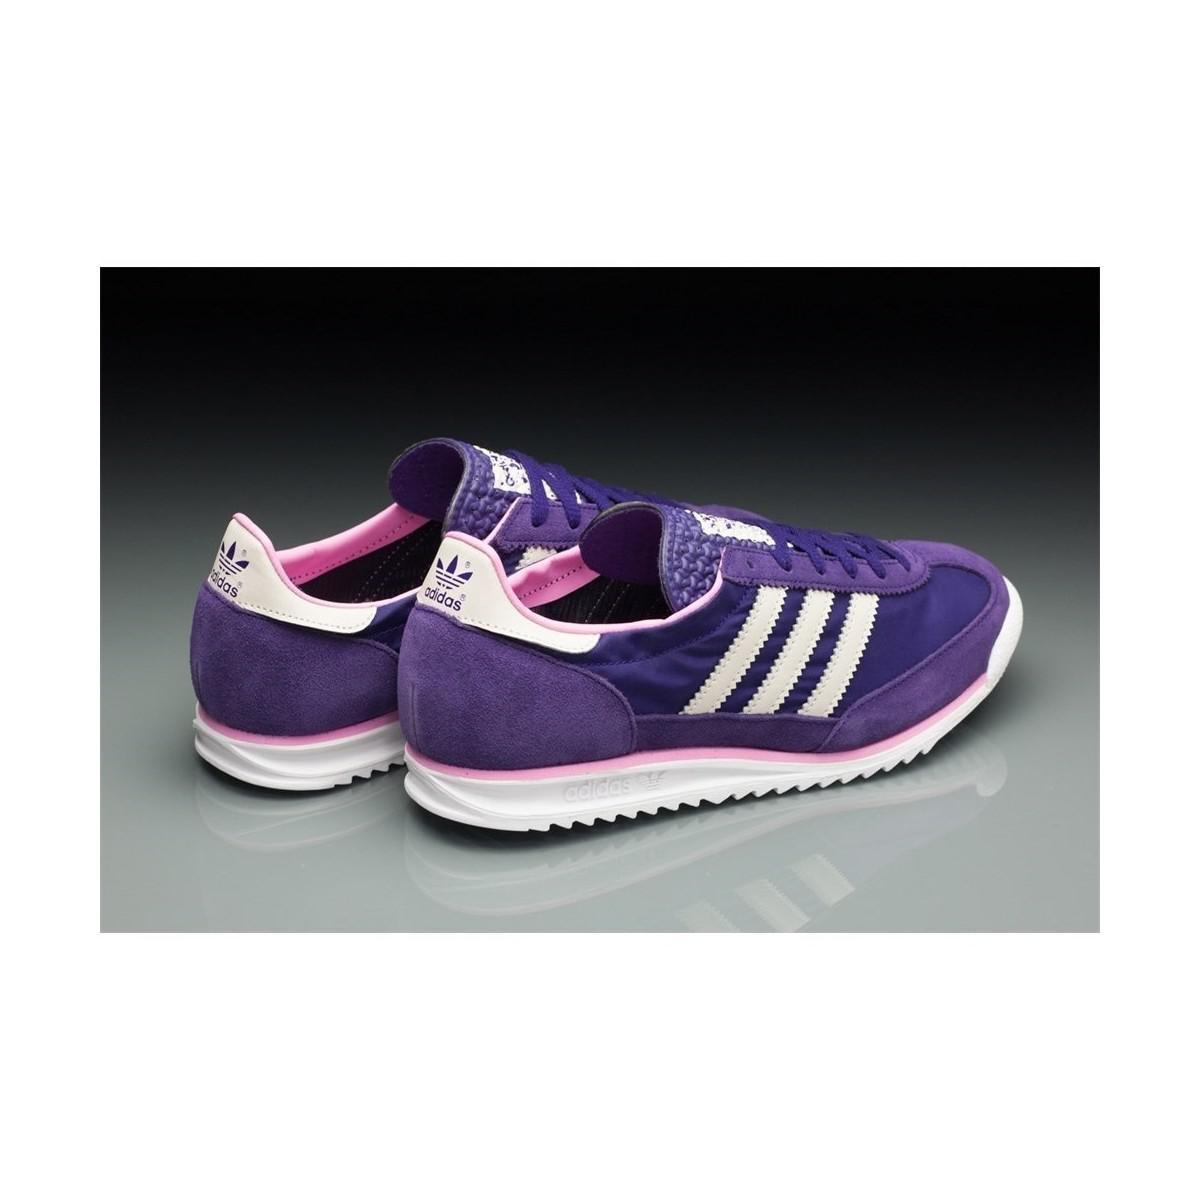 Virgen Gigante Alternativa  adidas Sl 72 W Women's Shoes (trainers) In Purple - Lyst